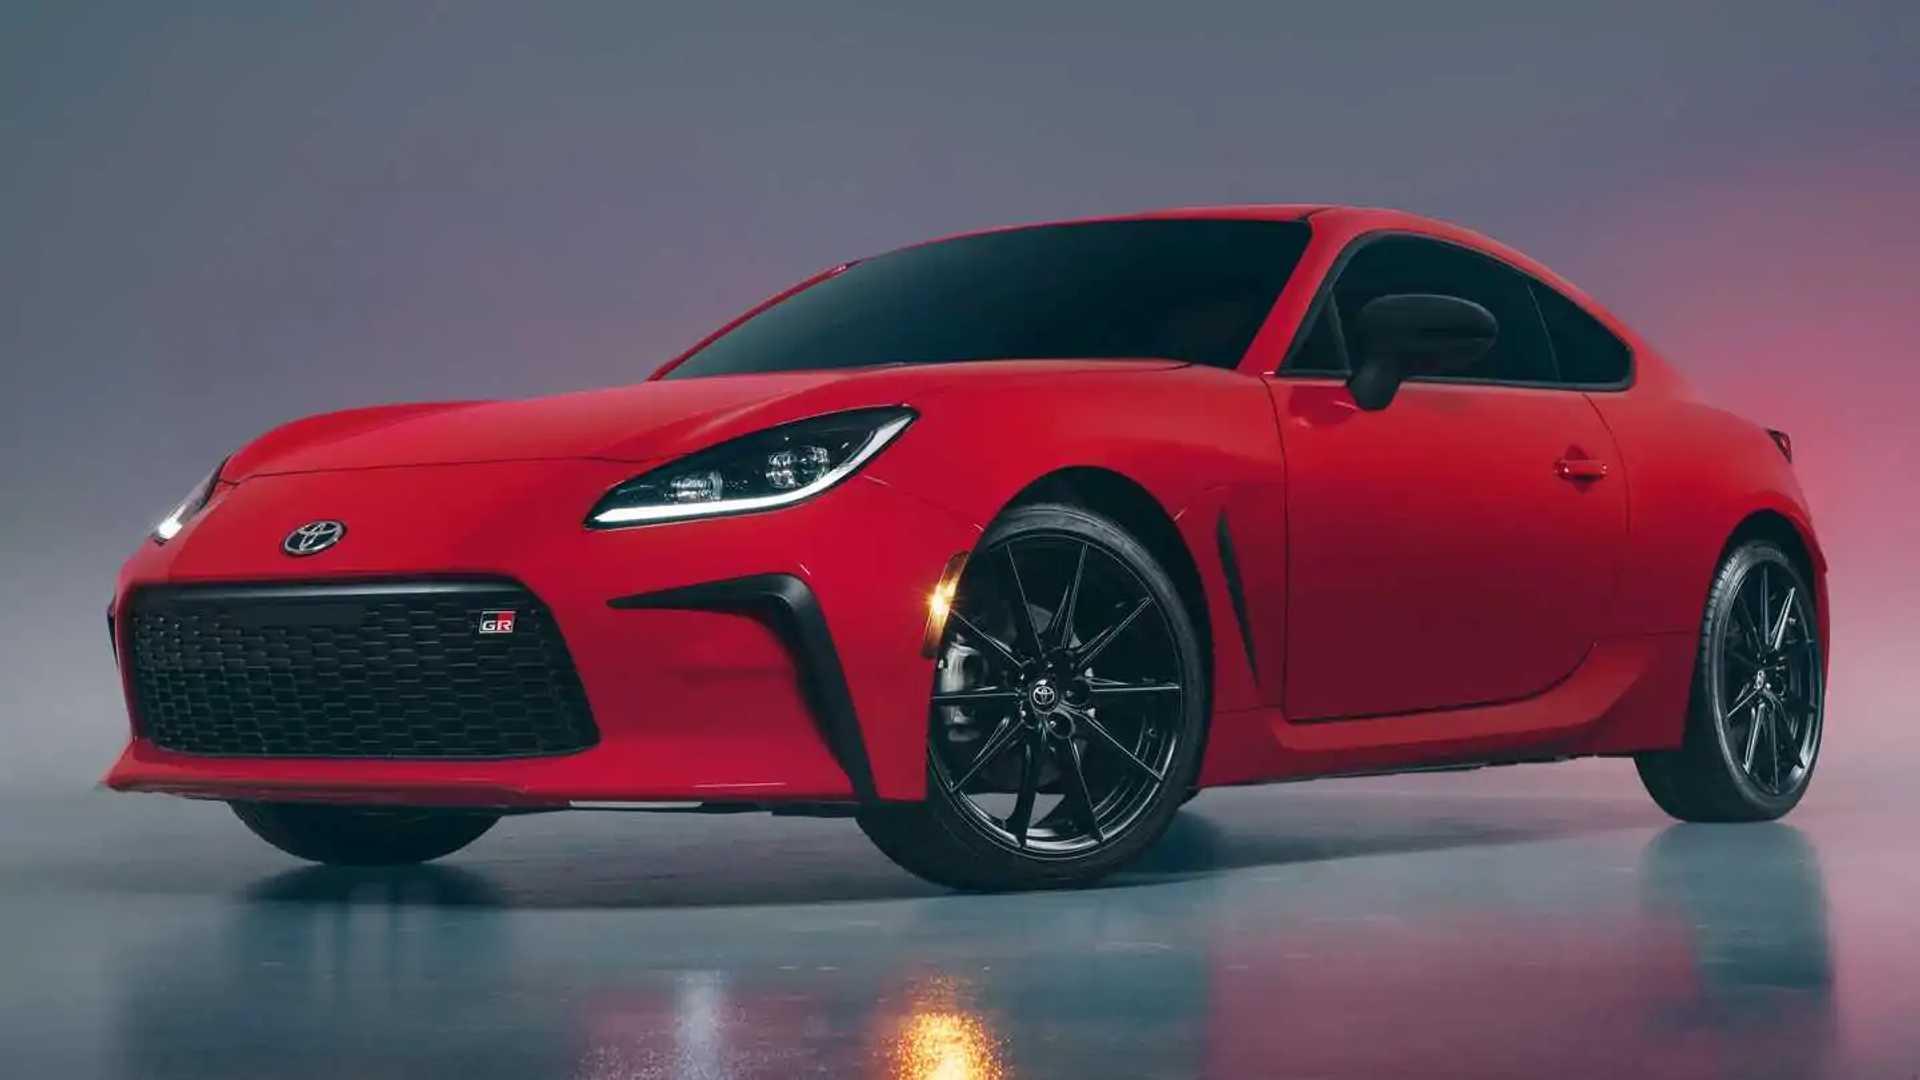 2022 Toyota GR 86 cuarto delantero exterior